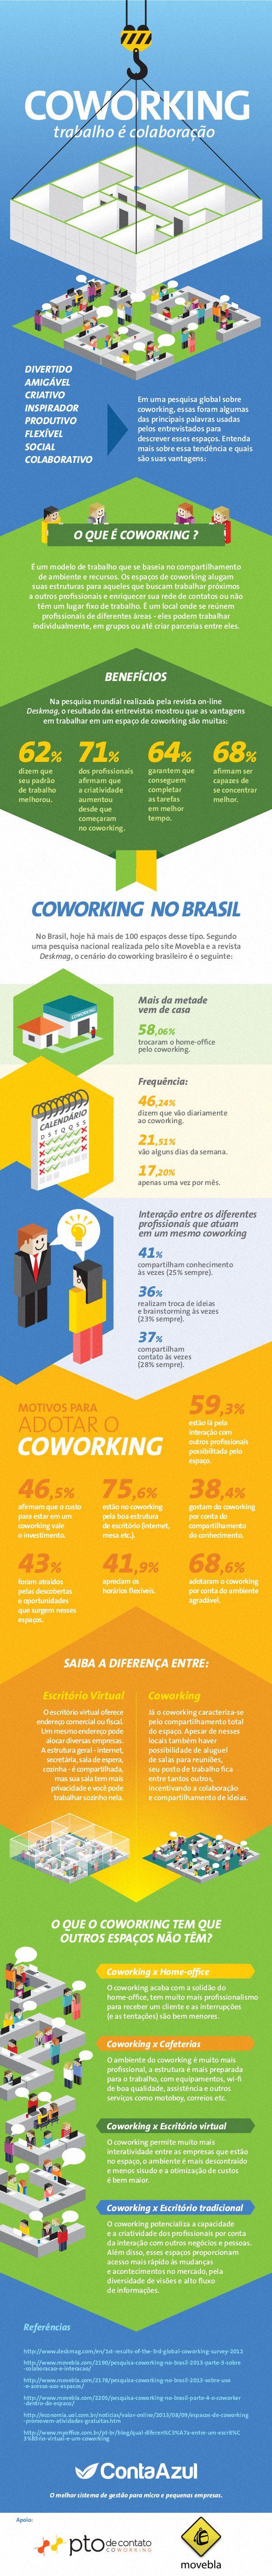 Infografico Coworking no Brasil - Conta Azul